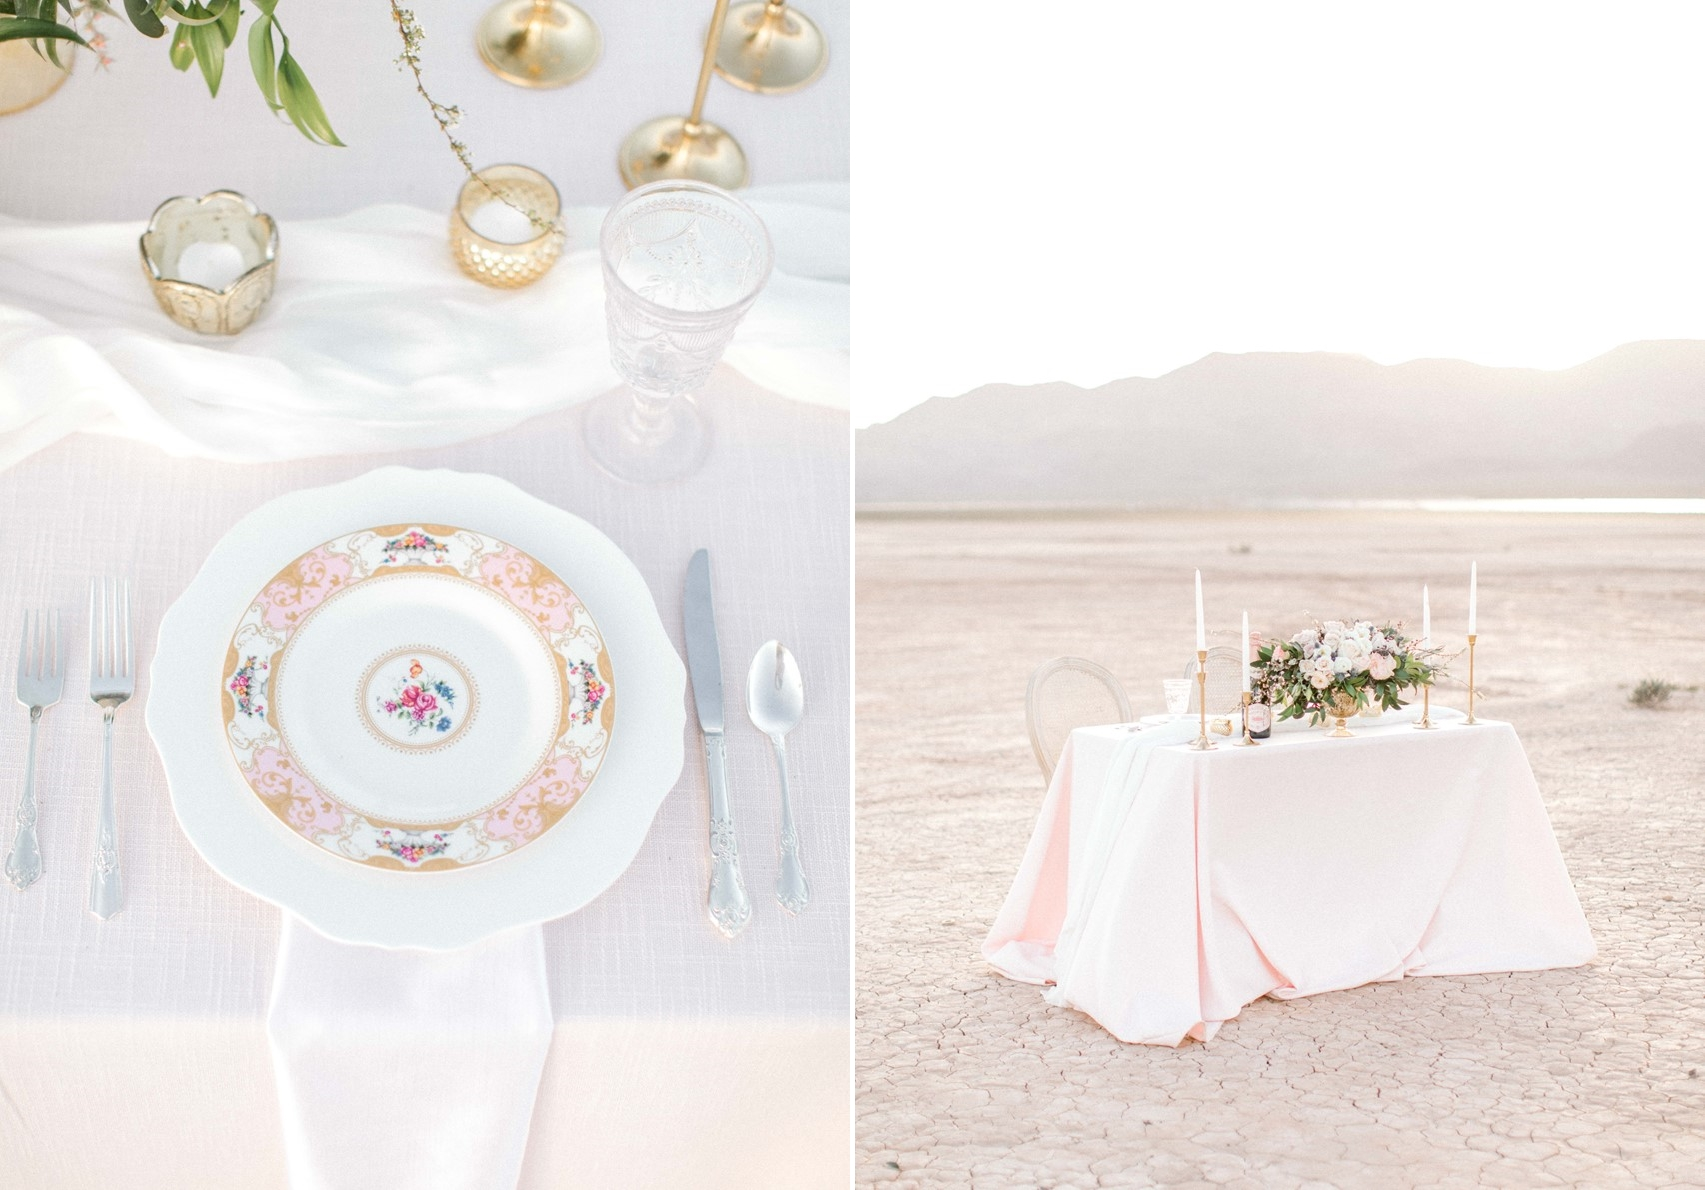 Desert Wedding Place Setting